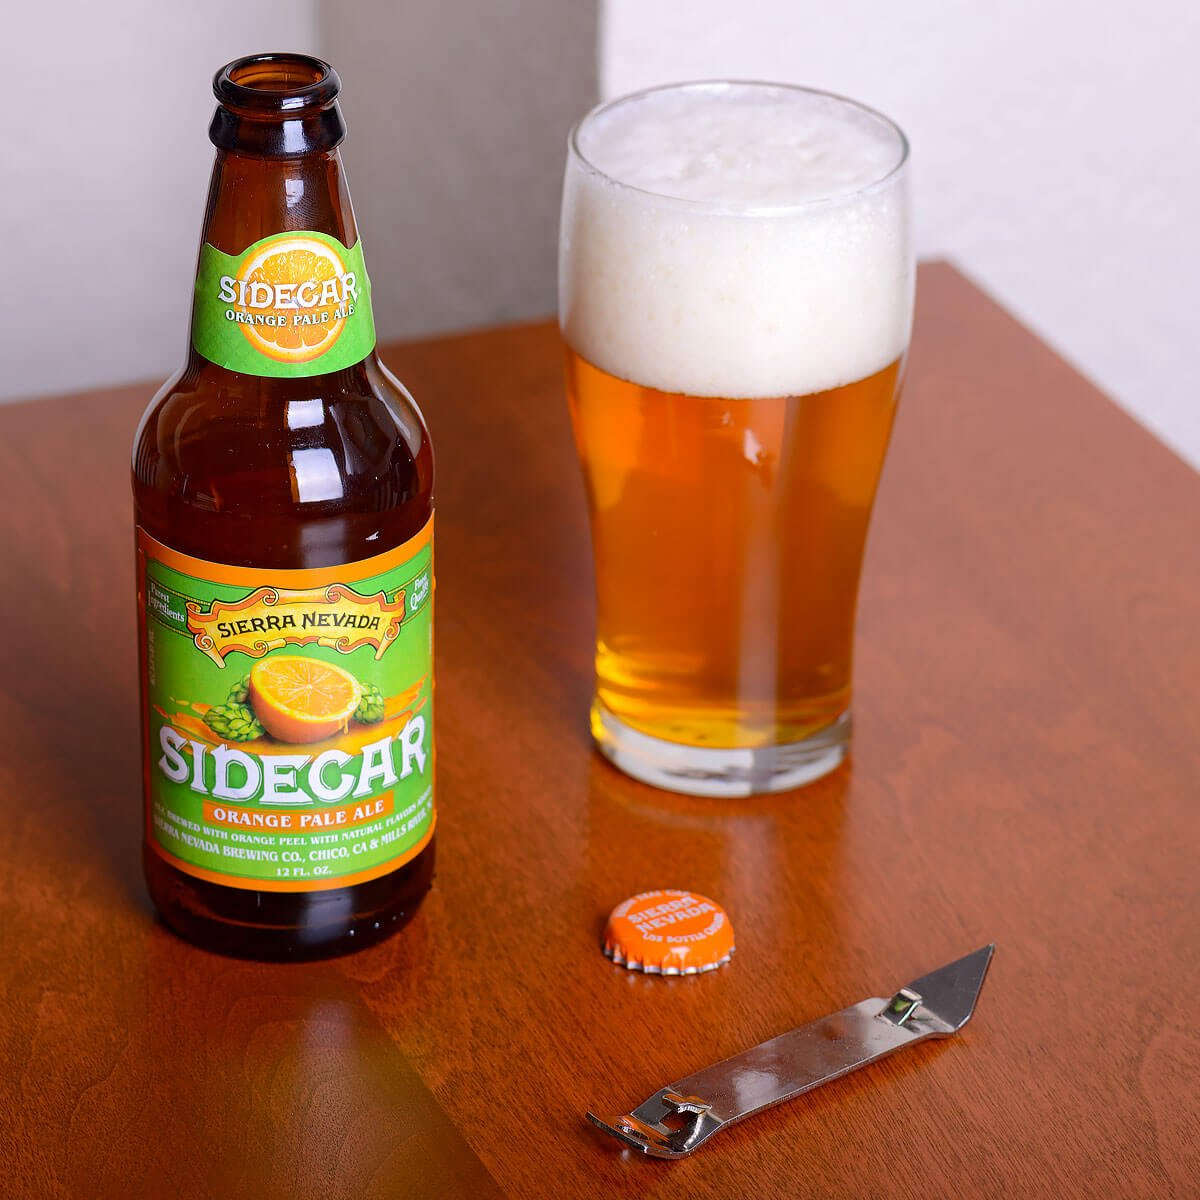 Sidecar Orange Pale Ale, an American Pale Ale by Sierra Nevada Brewing Co.